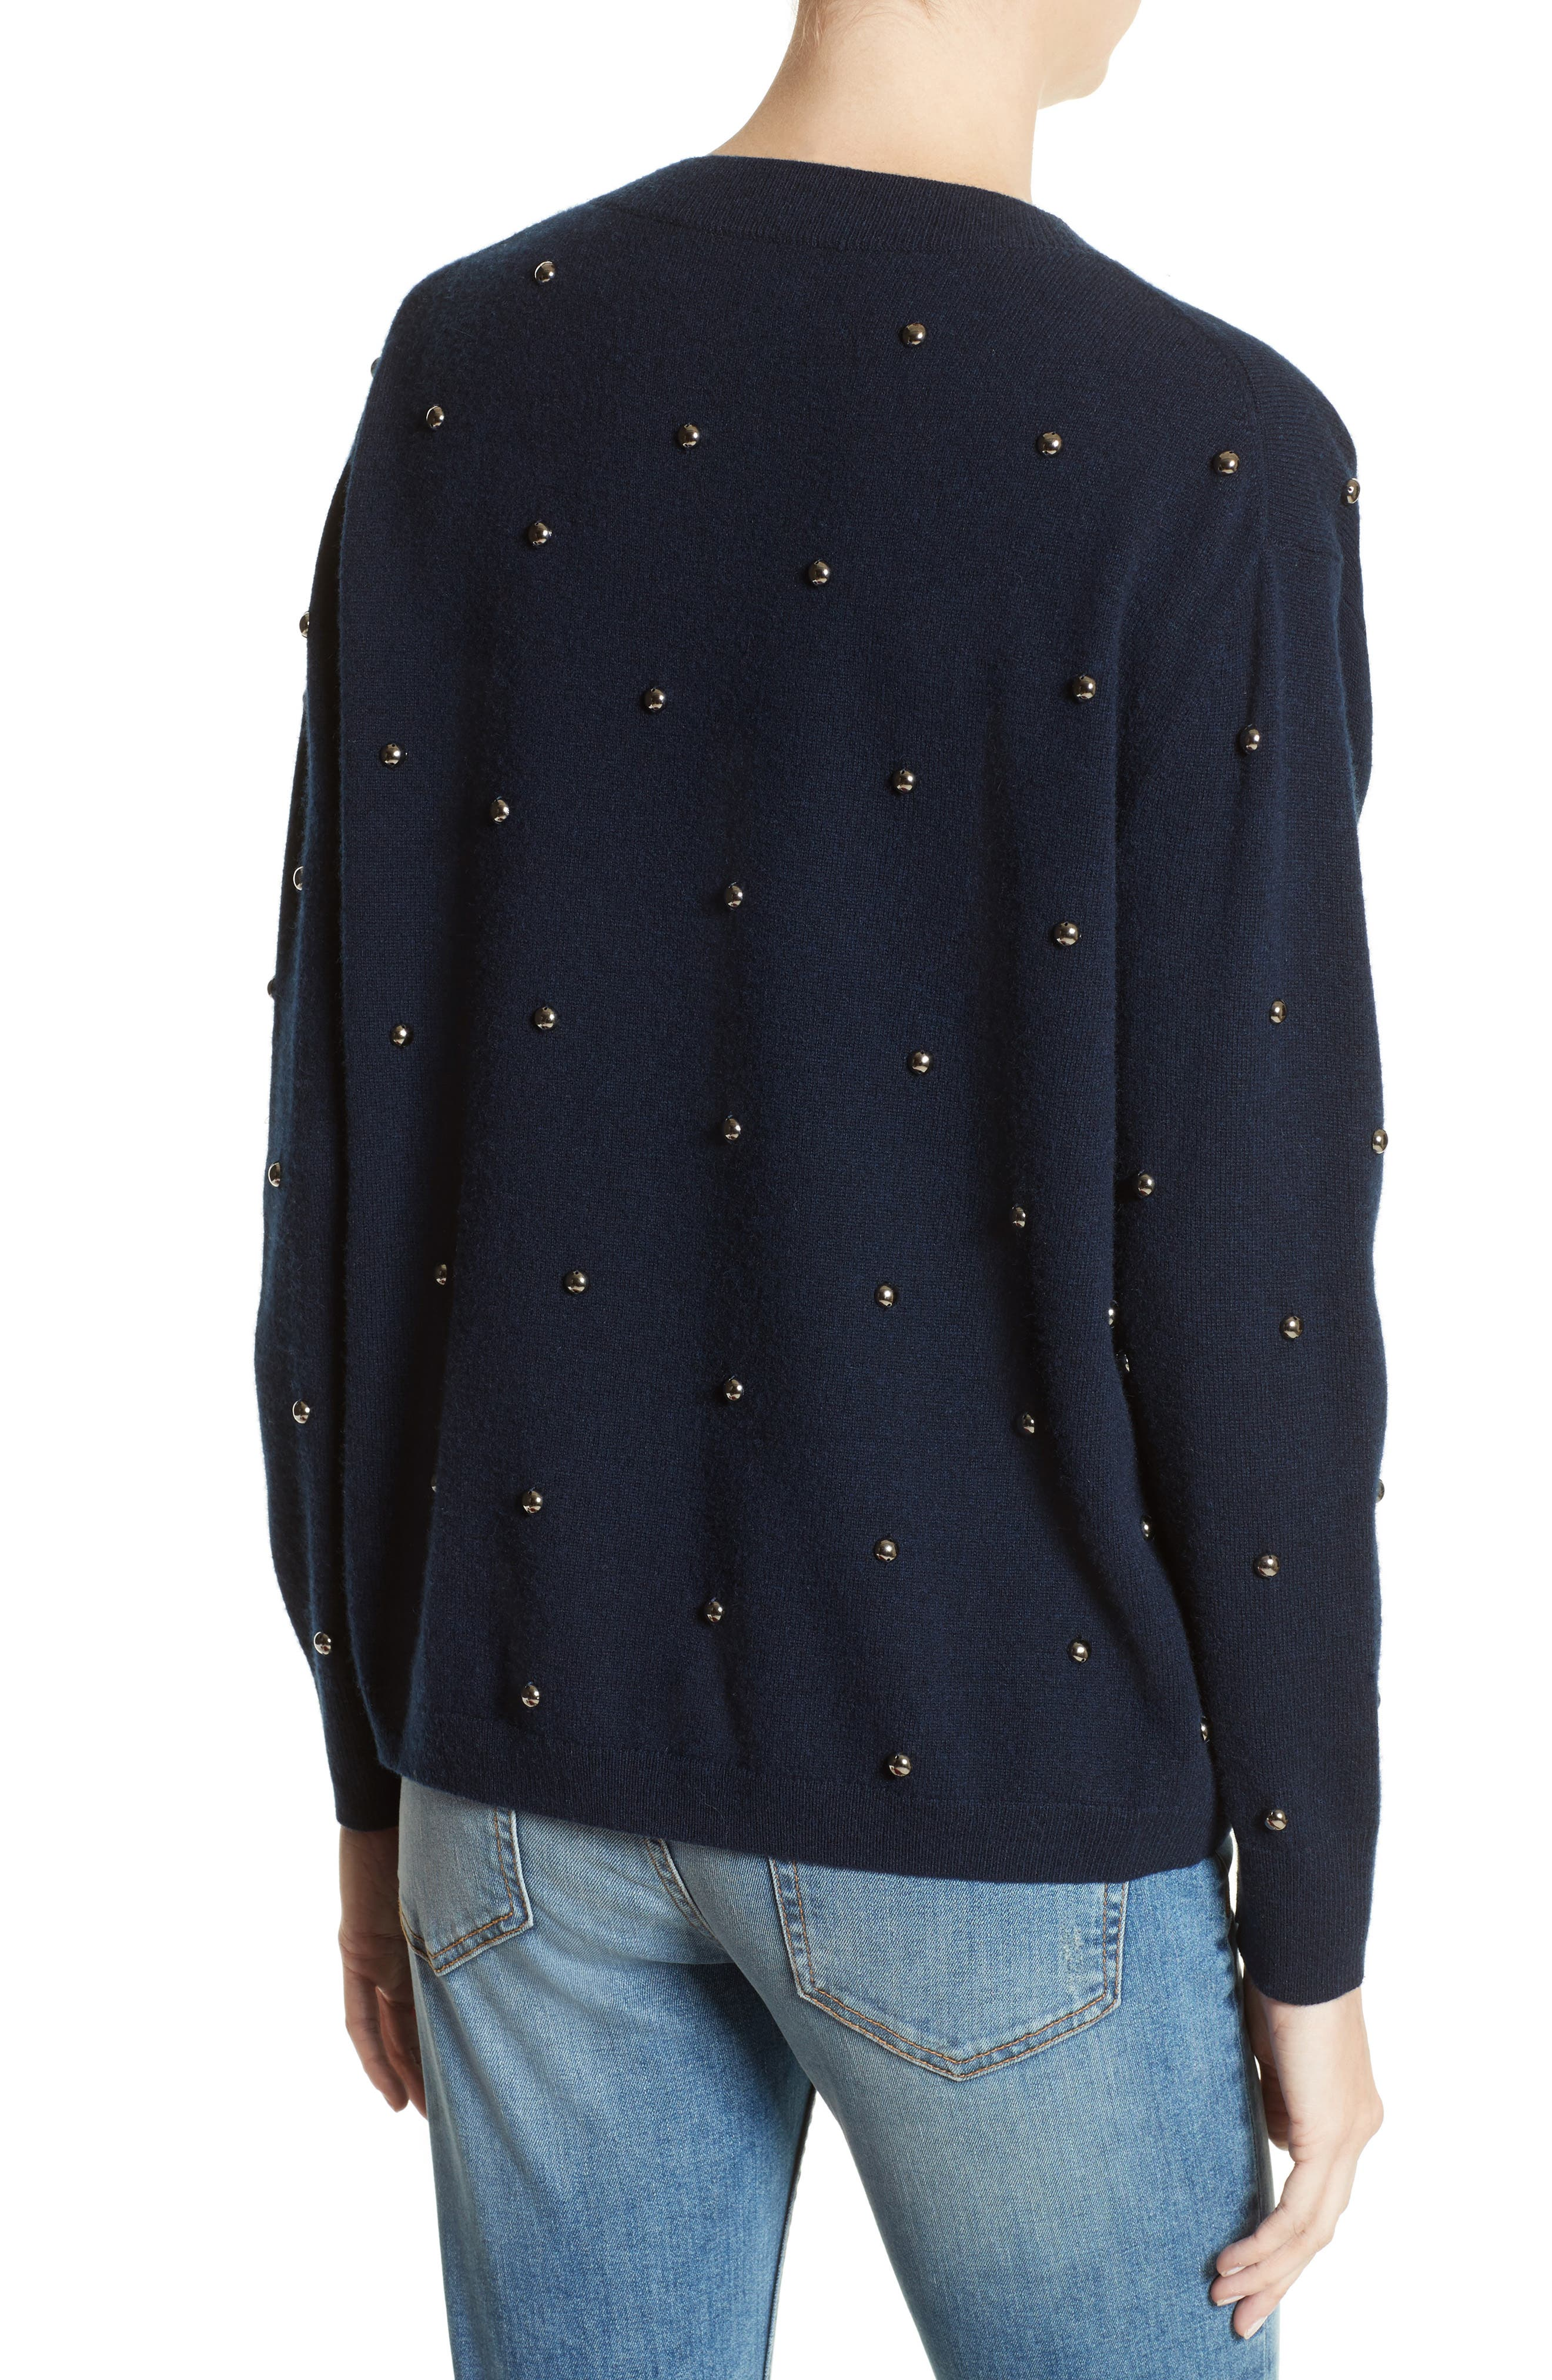 Alternate Image 2  - The Kooples Embellished Wool & Cashmere Sweater